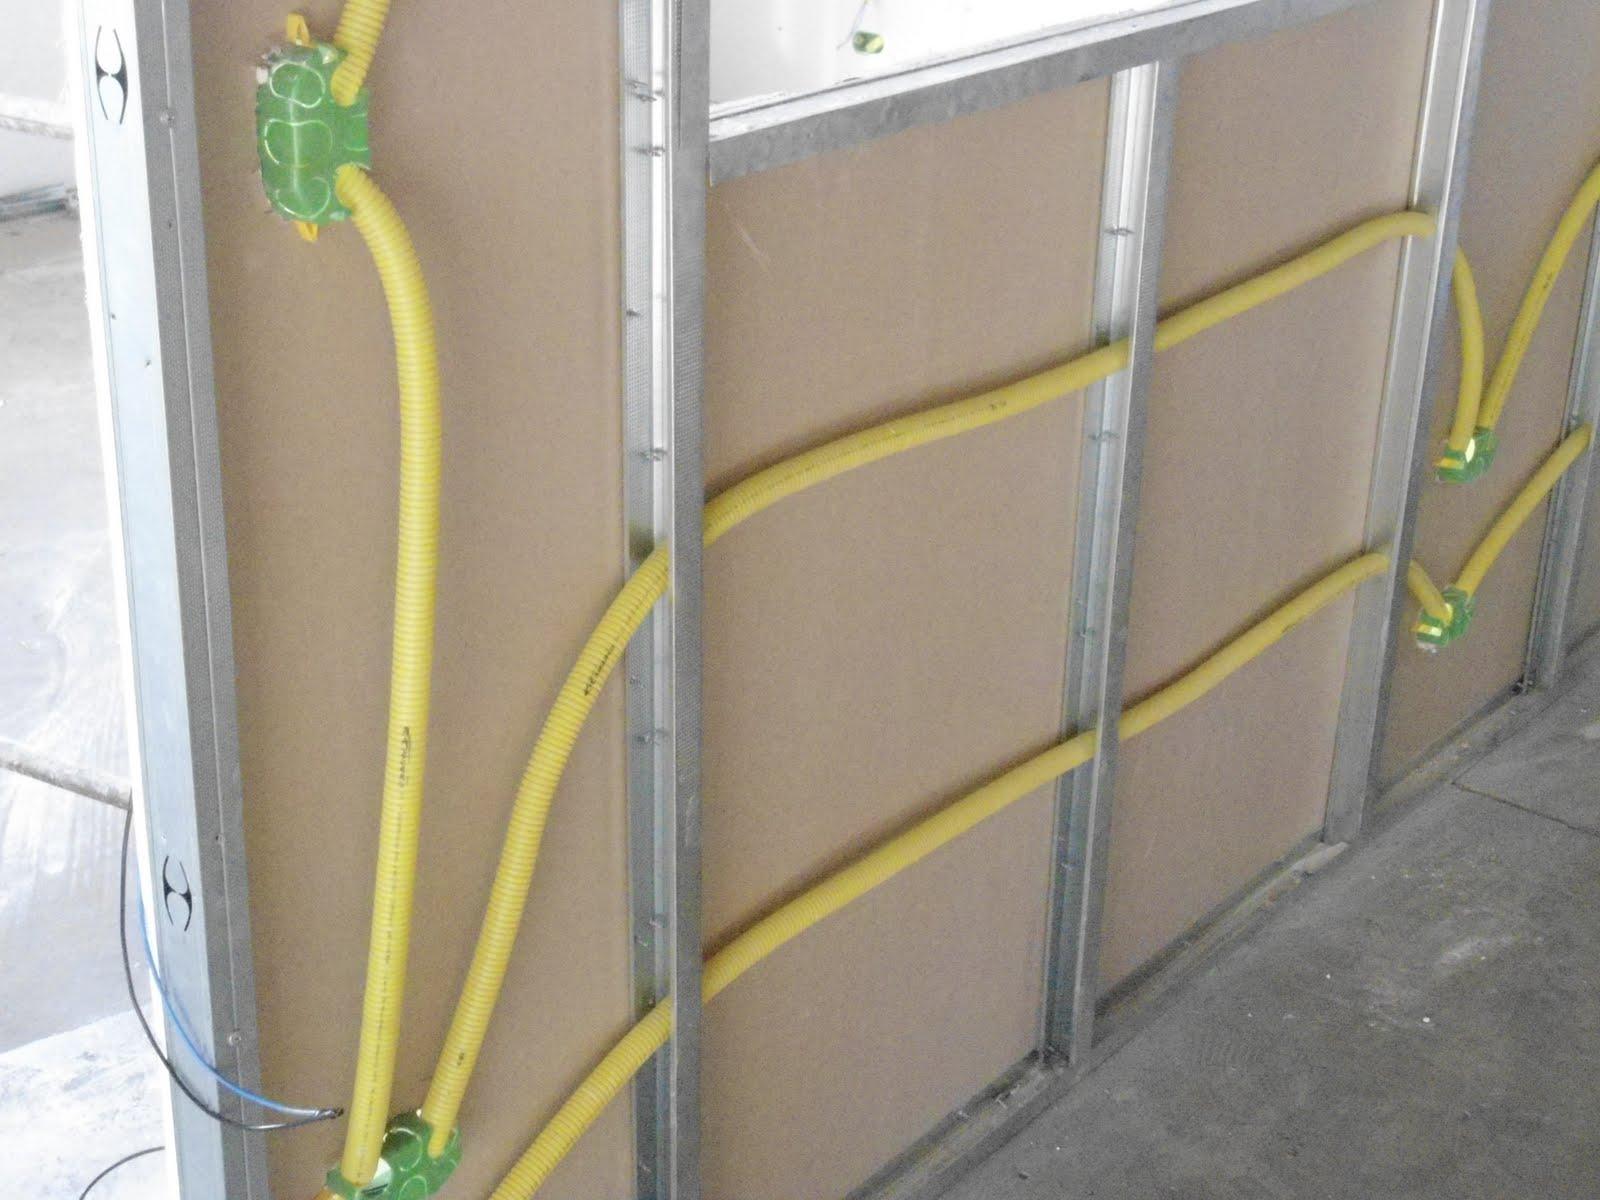 Ado Piso Wifi Wiring Diagram F150 2006 Preço M2 Gesso Acartonado Sp Teto Drywall